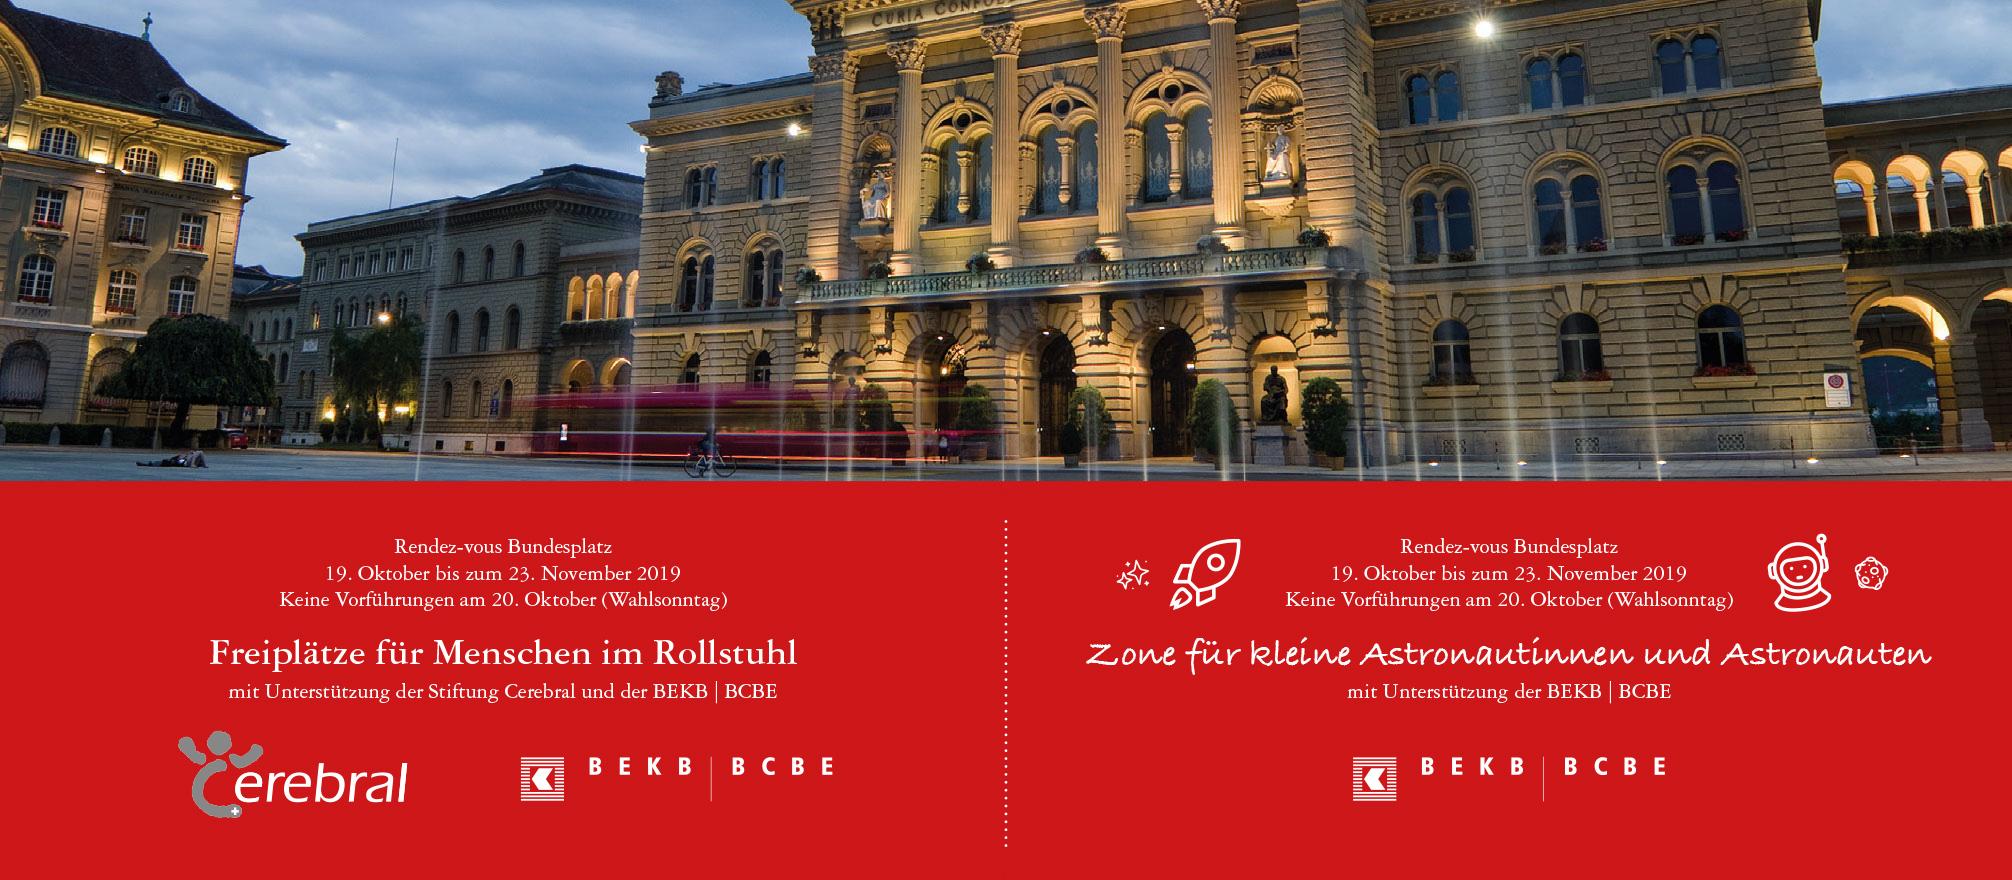 Infoblatt Rote Zone beim Rendezvous-Bundesplatz